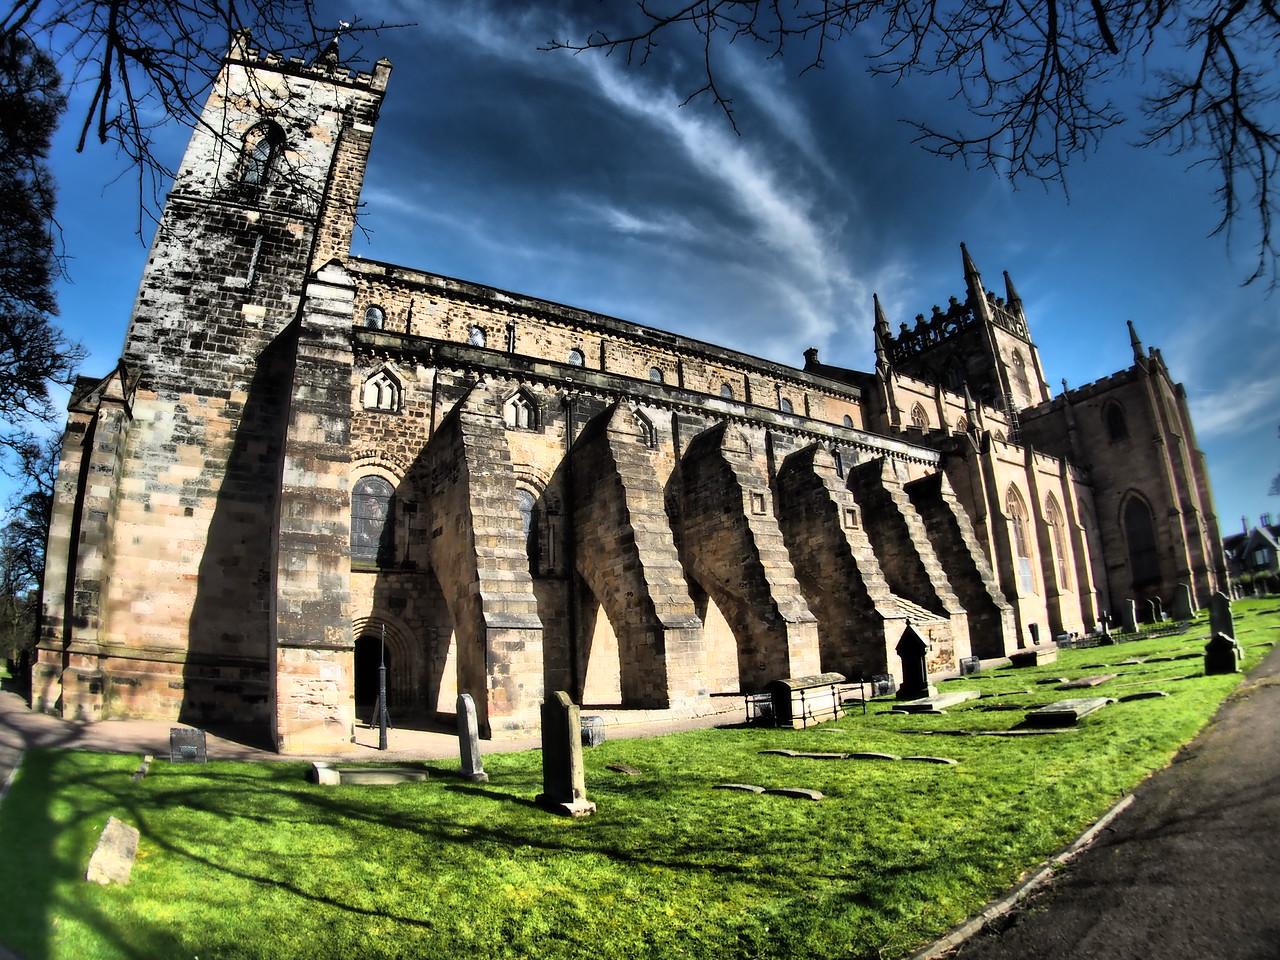 Dunfermline Abbey, Dunfermline, Scotland